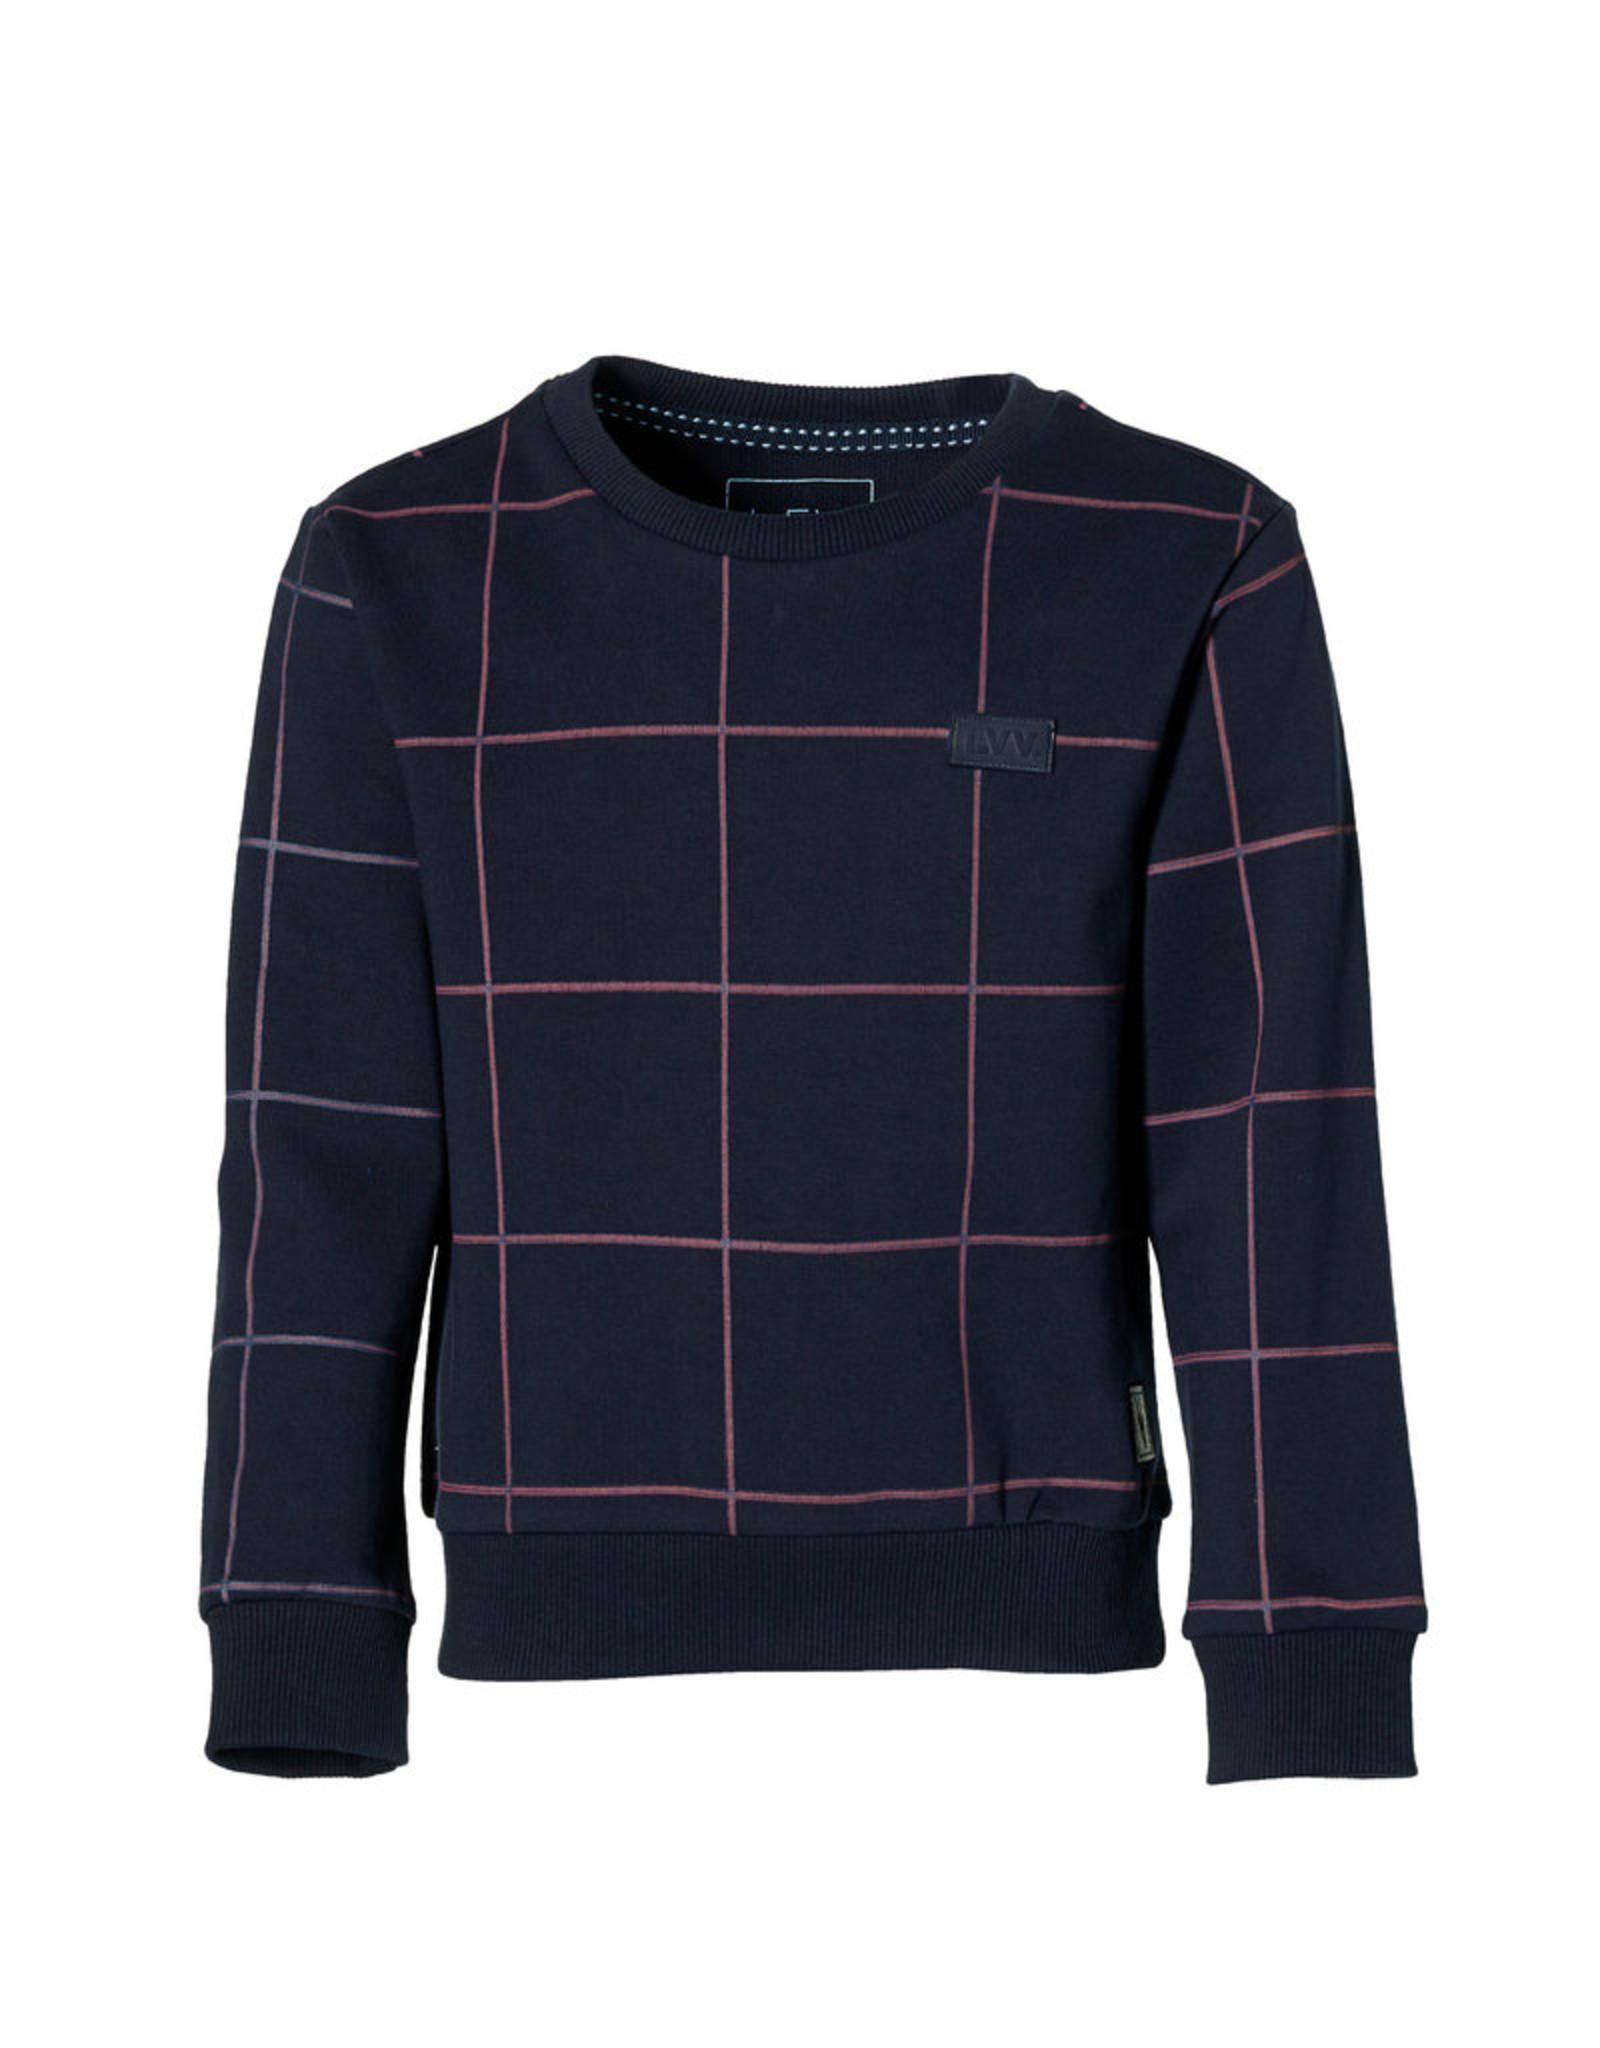 Levv Sweater Leo - donkerblauw grid